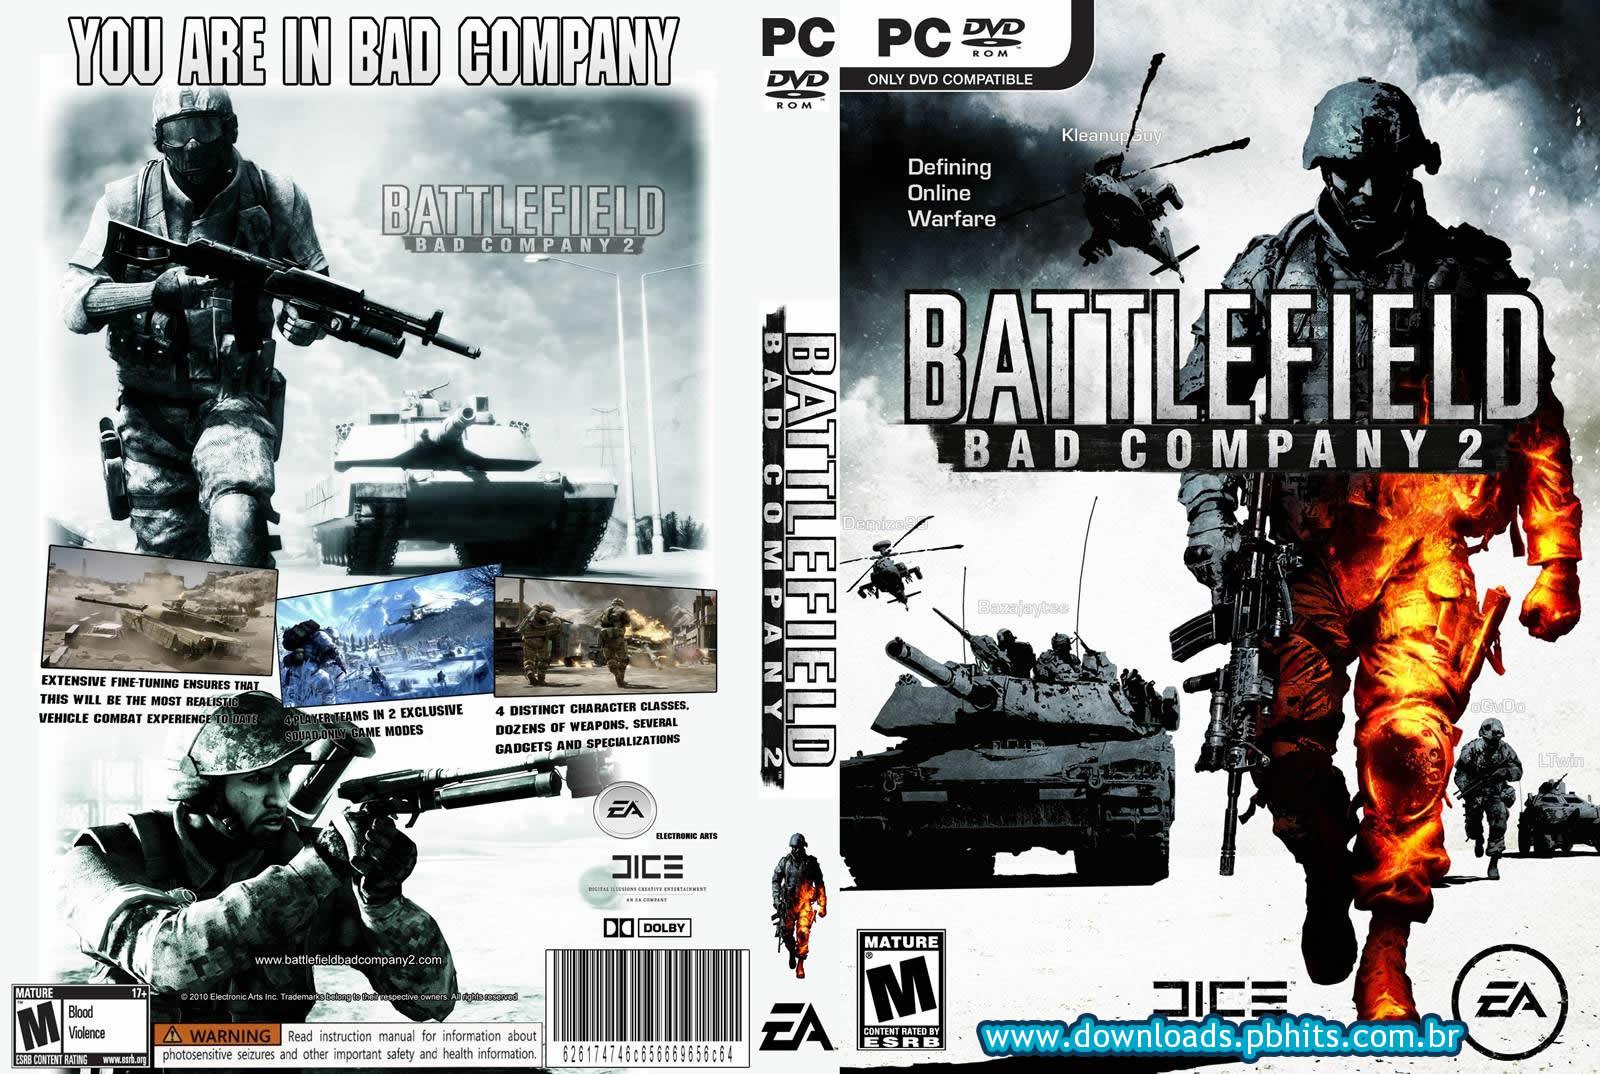 Battlefield Bad Company 2 Crack Serial games pc: 4 years11 MB 02 Battlefiel